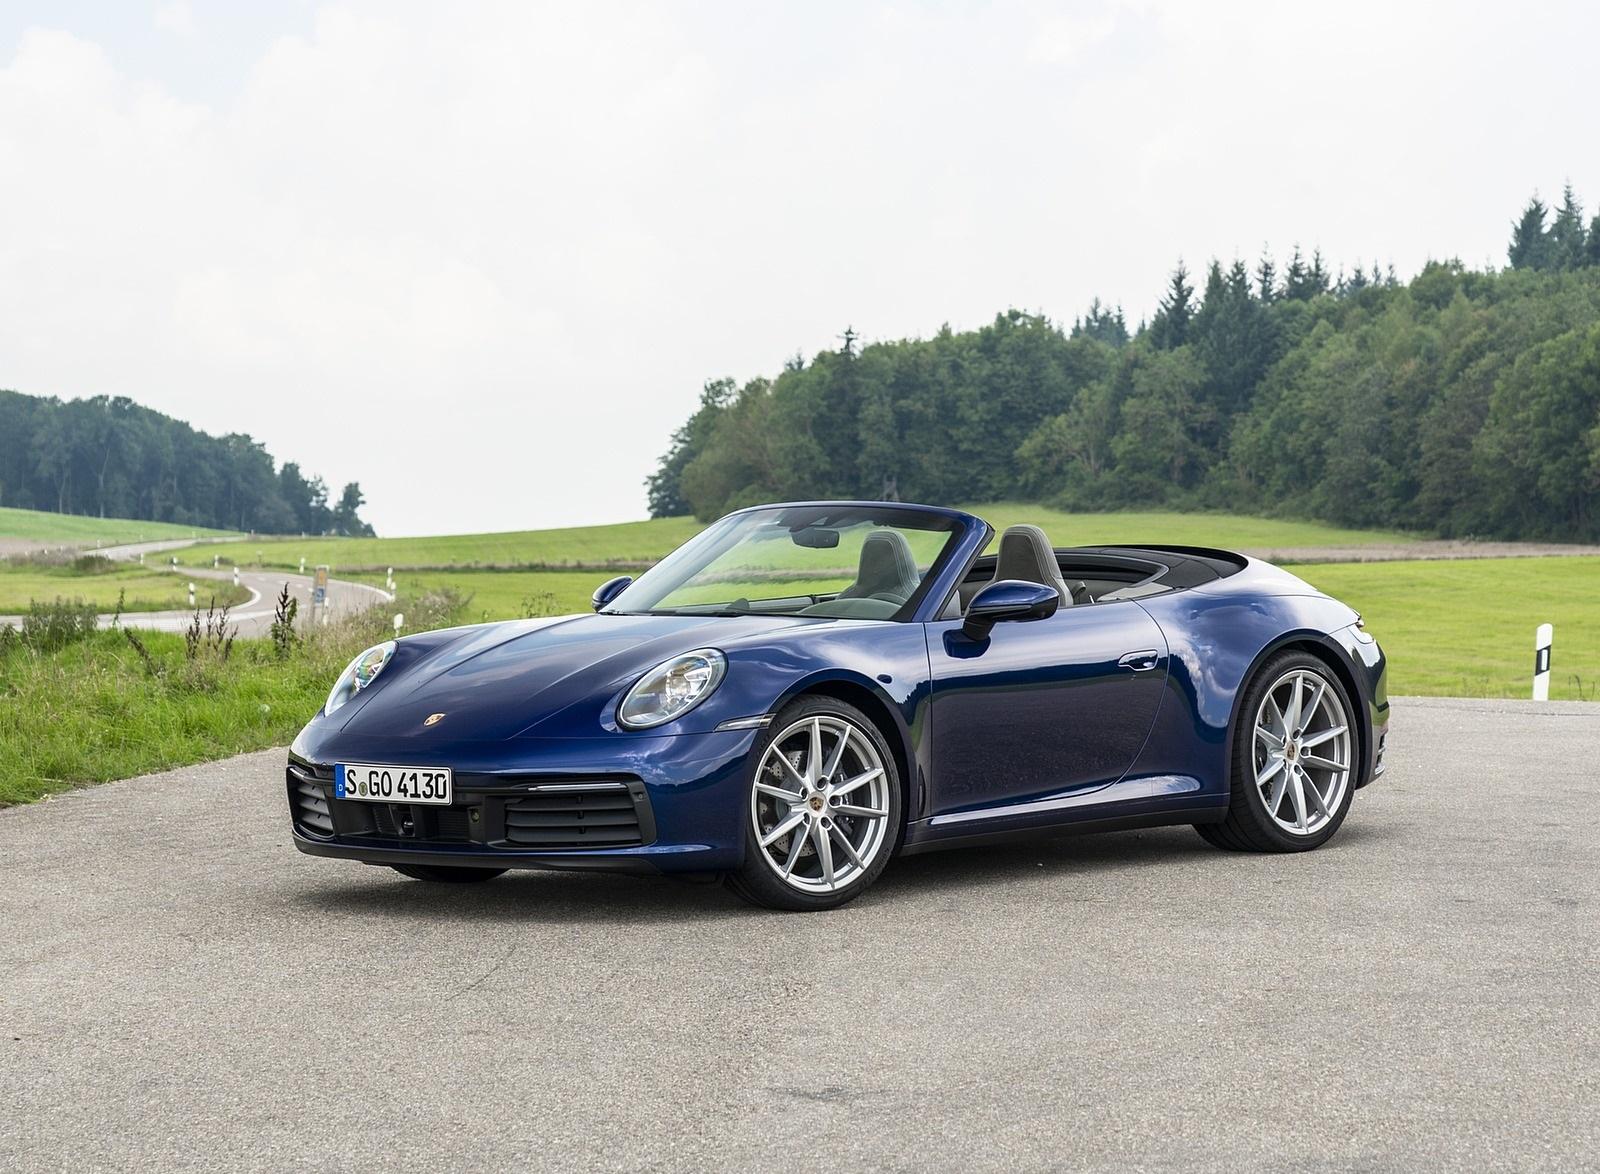 2020 Porsche 911 Carrera Cabriolet Color Gentian Blue Metallic Front Three Quarter Wallpapers 23 Newcarcars